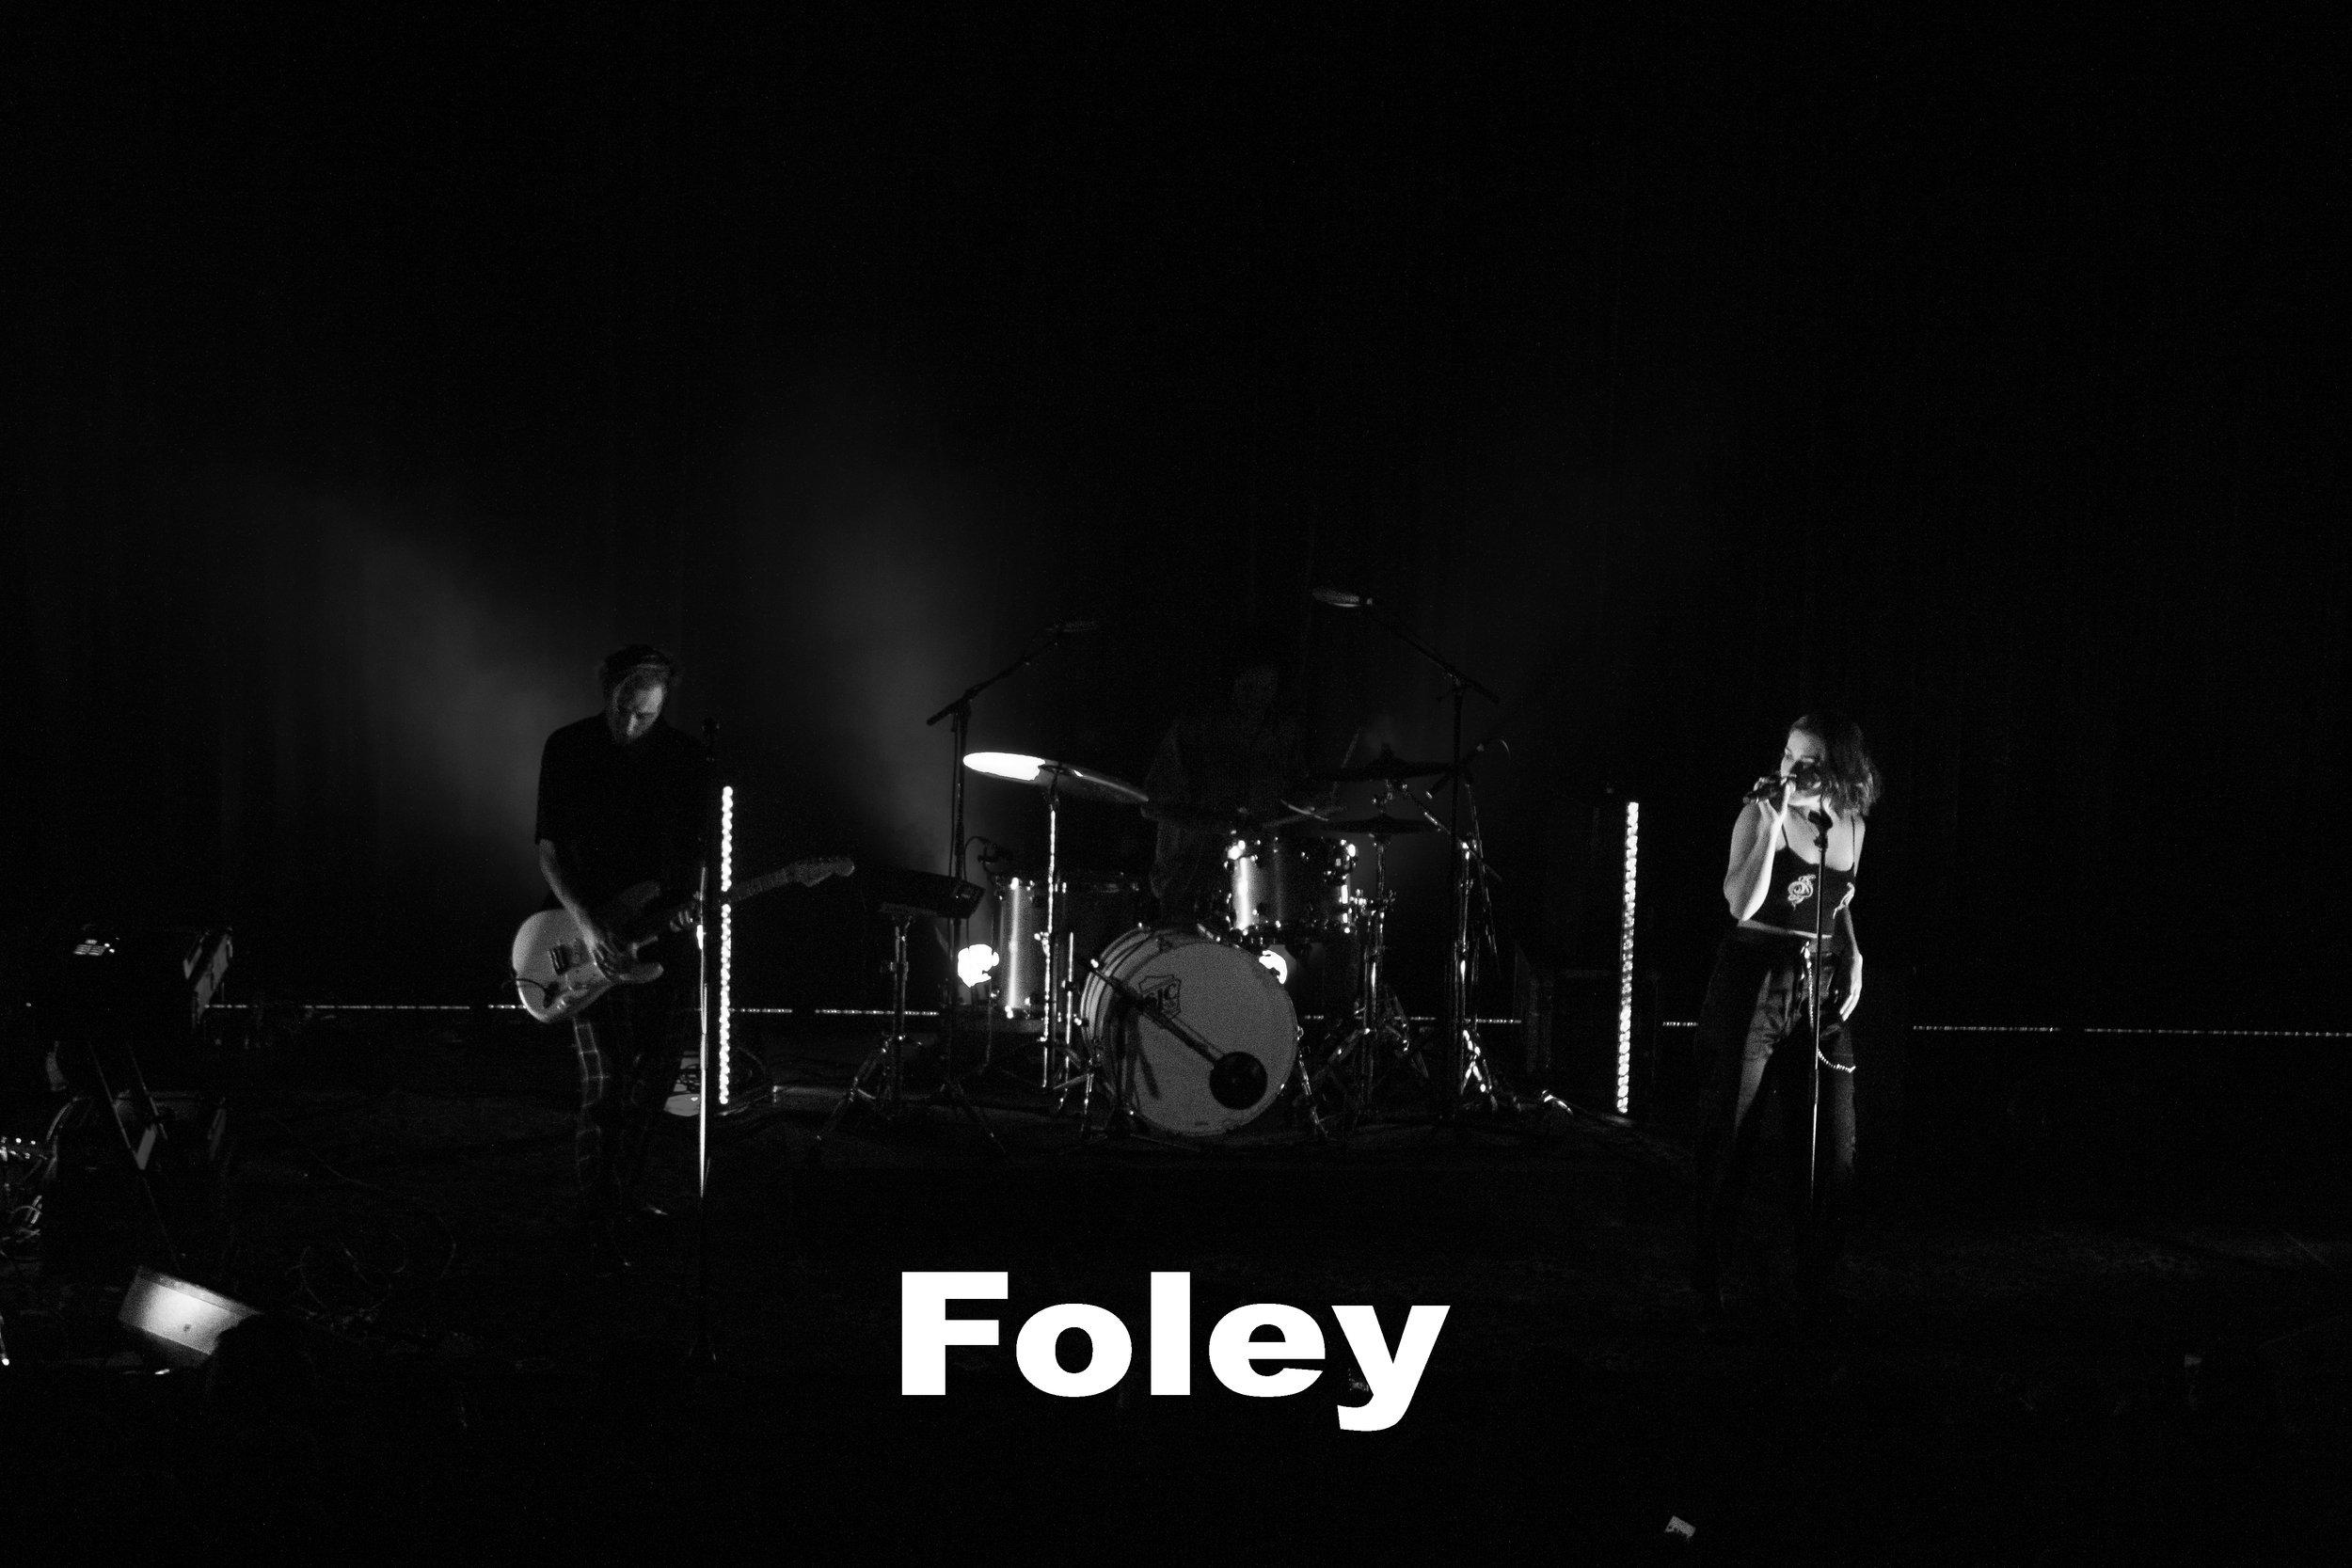 Foley-title.jpg